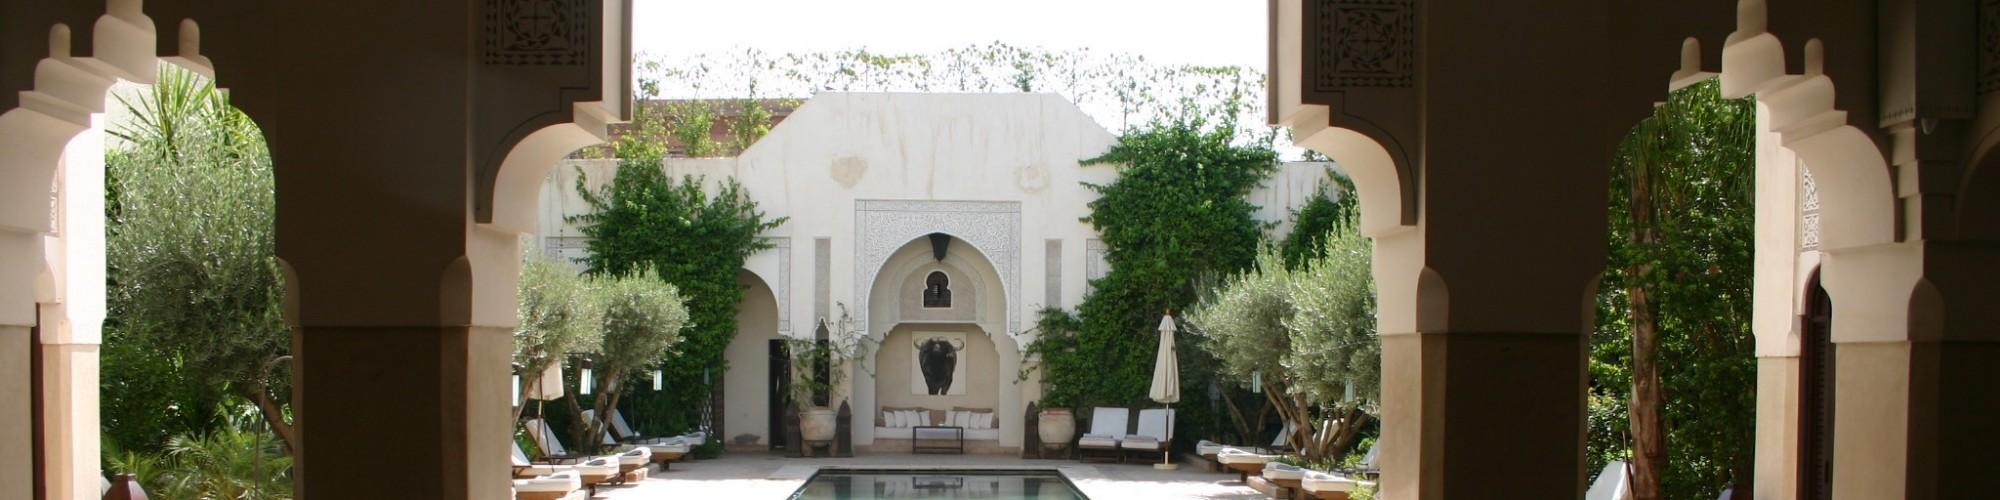 Villa Des Orangers, Marrakech